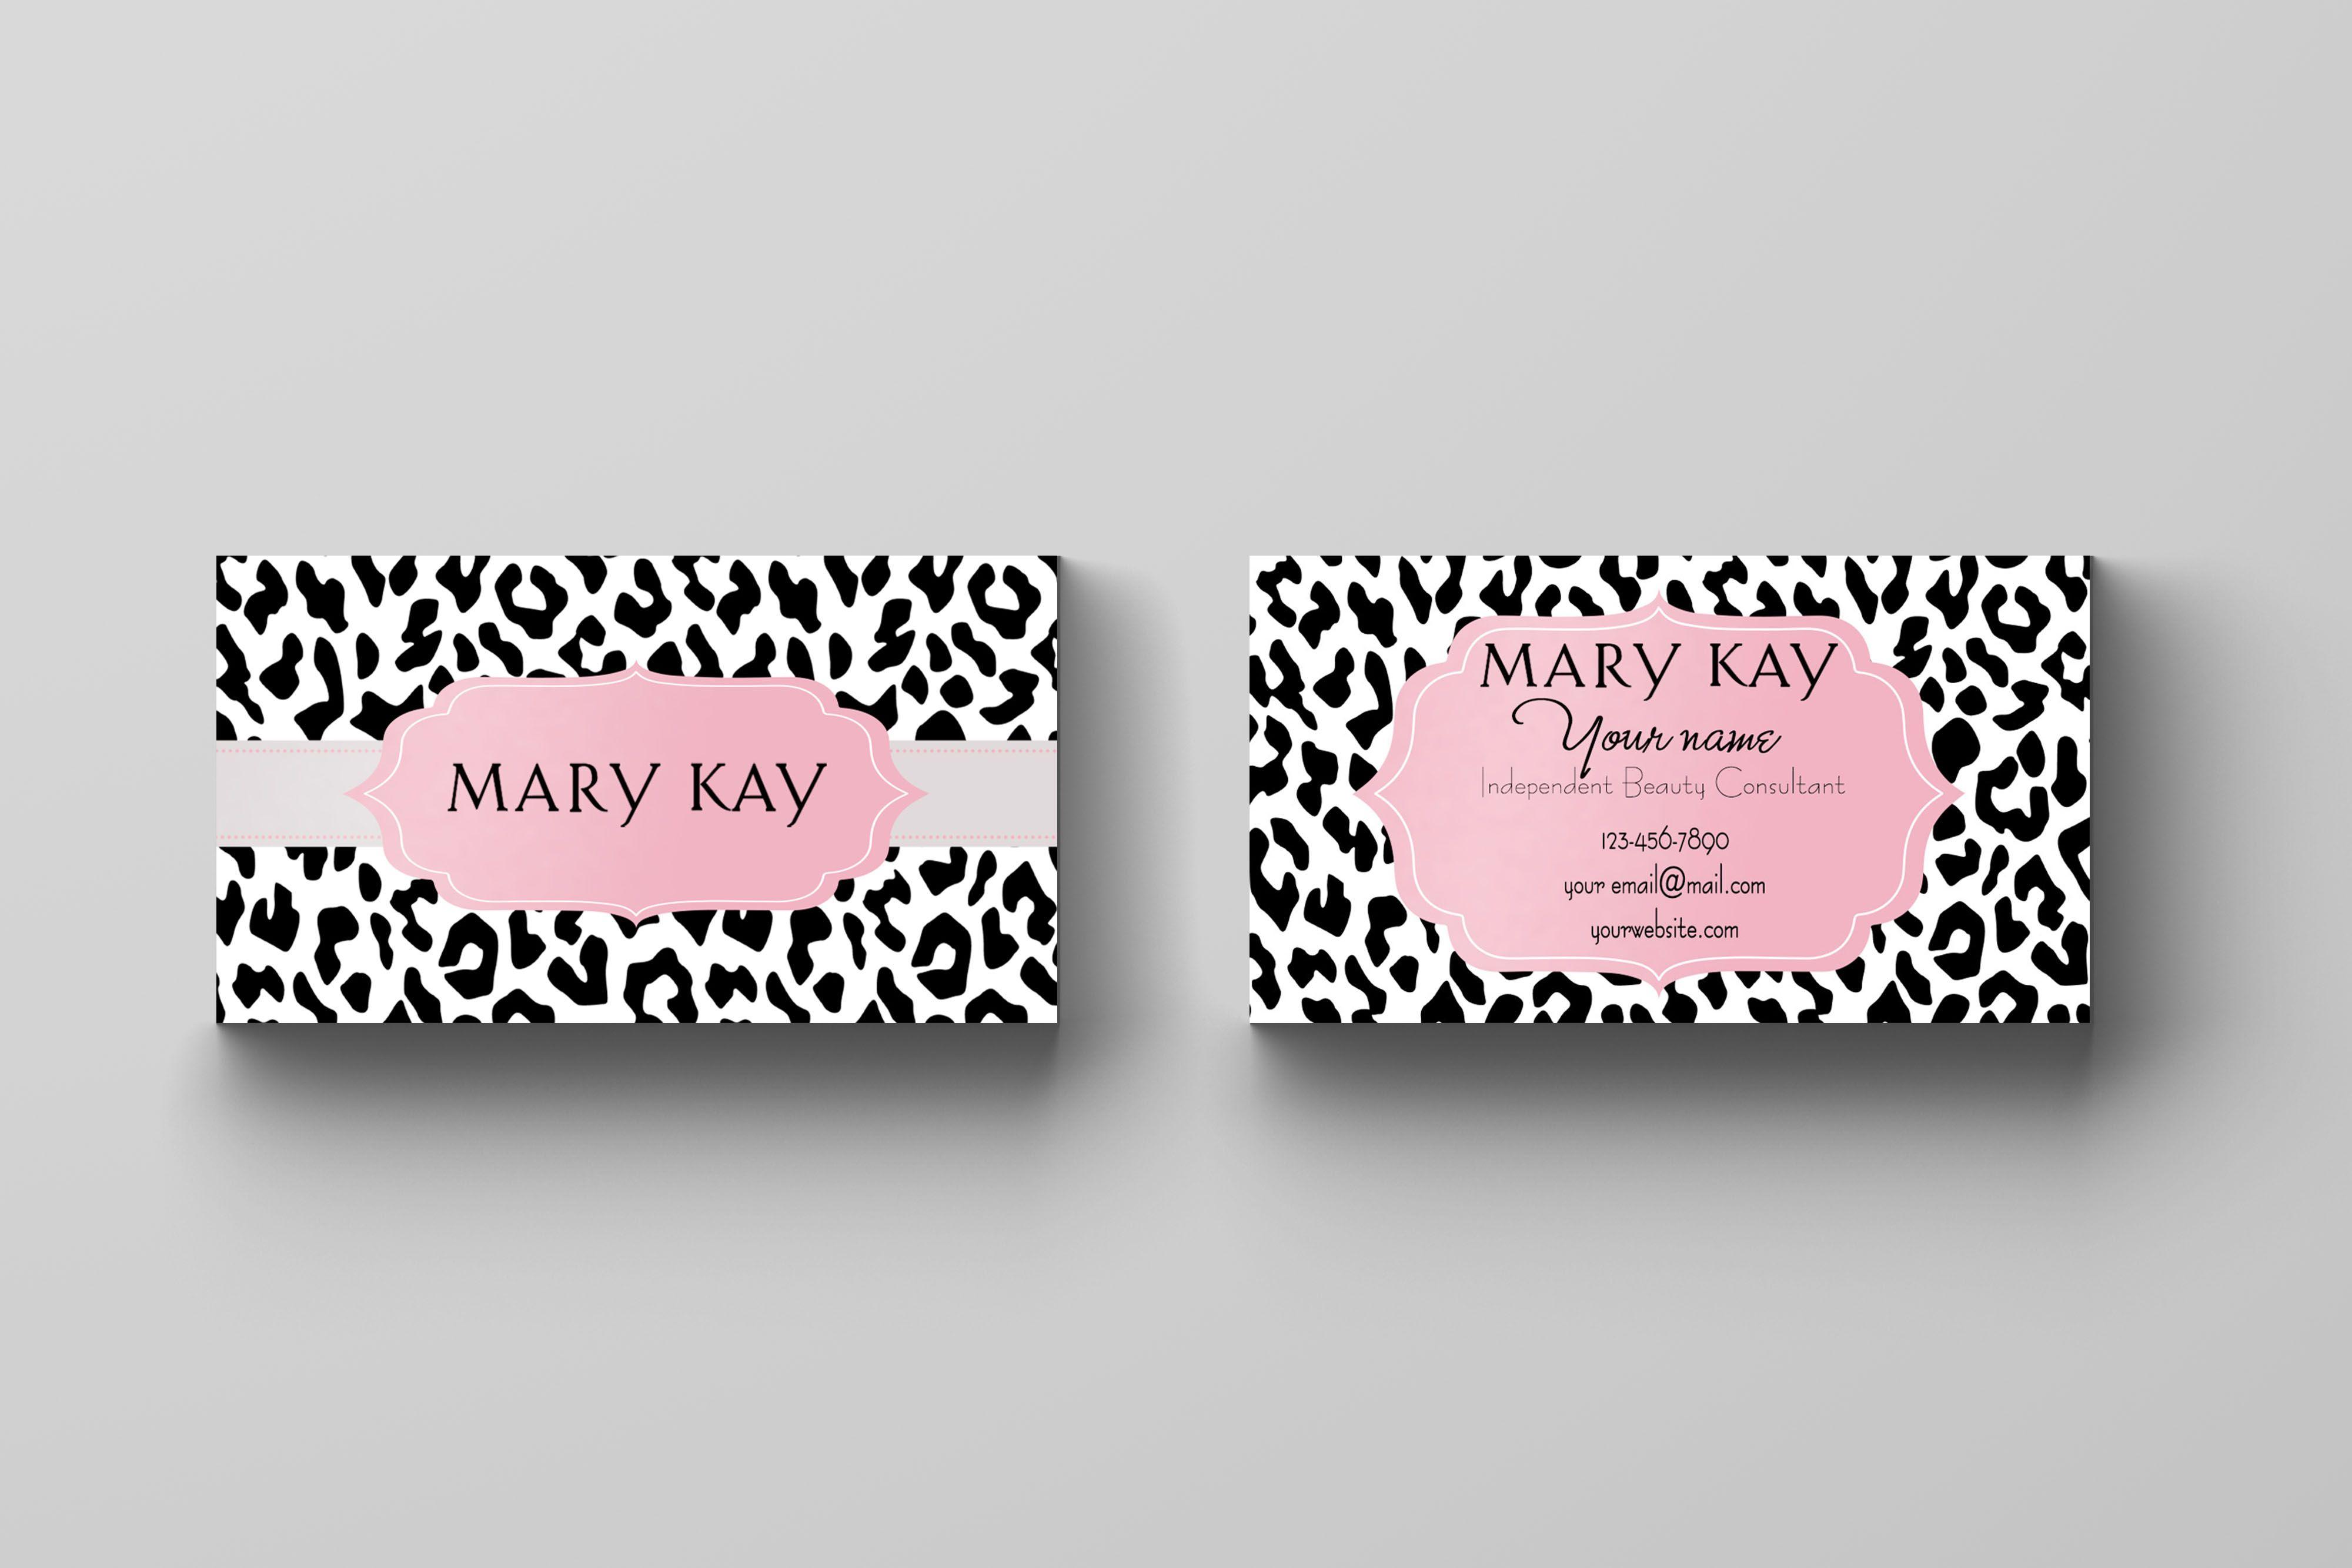 Mary Kay Business Card - Animal Print | Mary Kay Tool Box | Mary Kay - Free Printable Mary Kay Business Cards